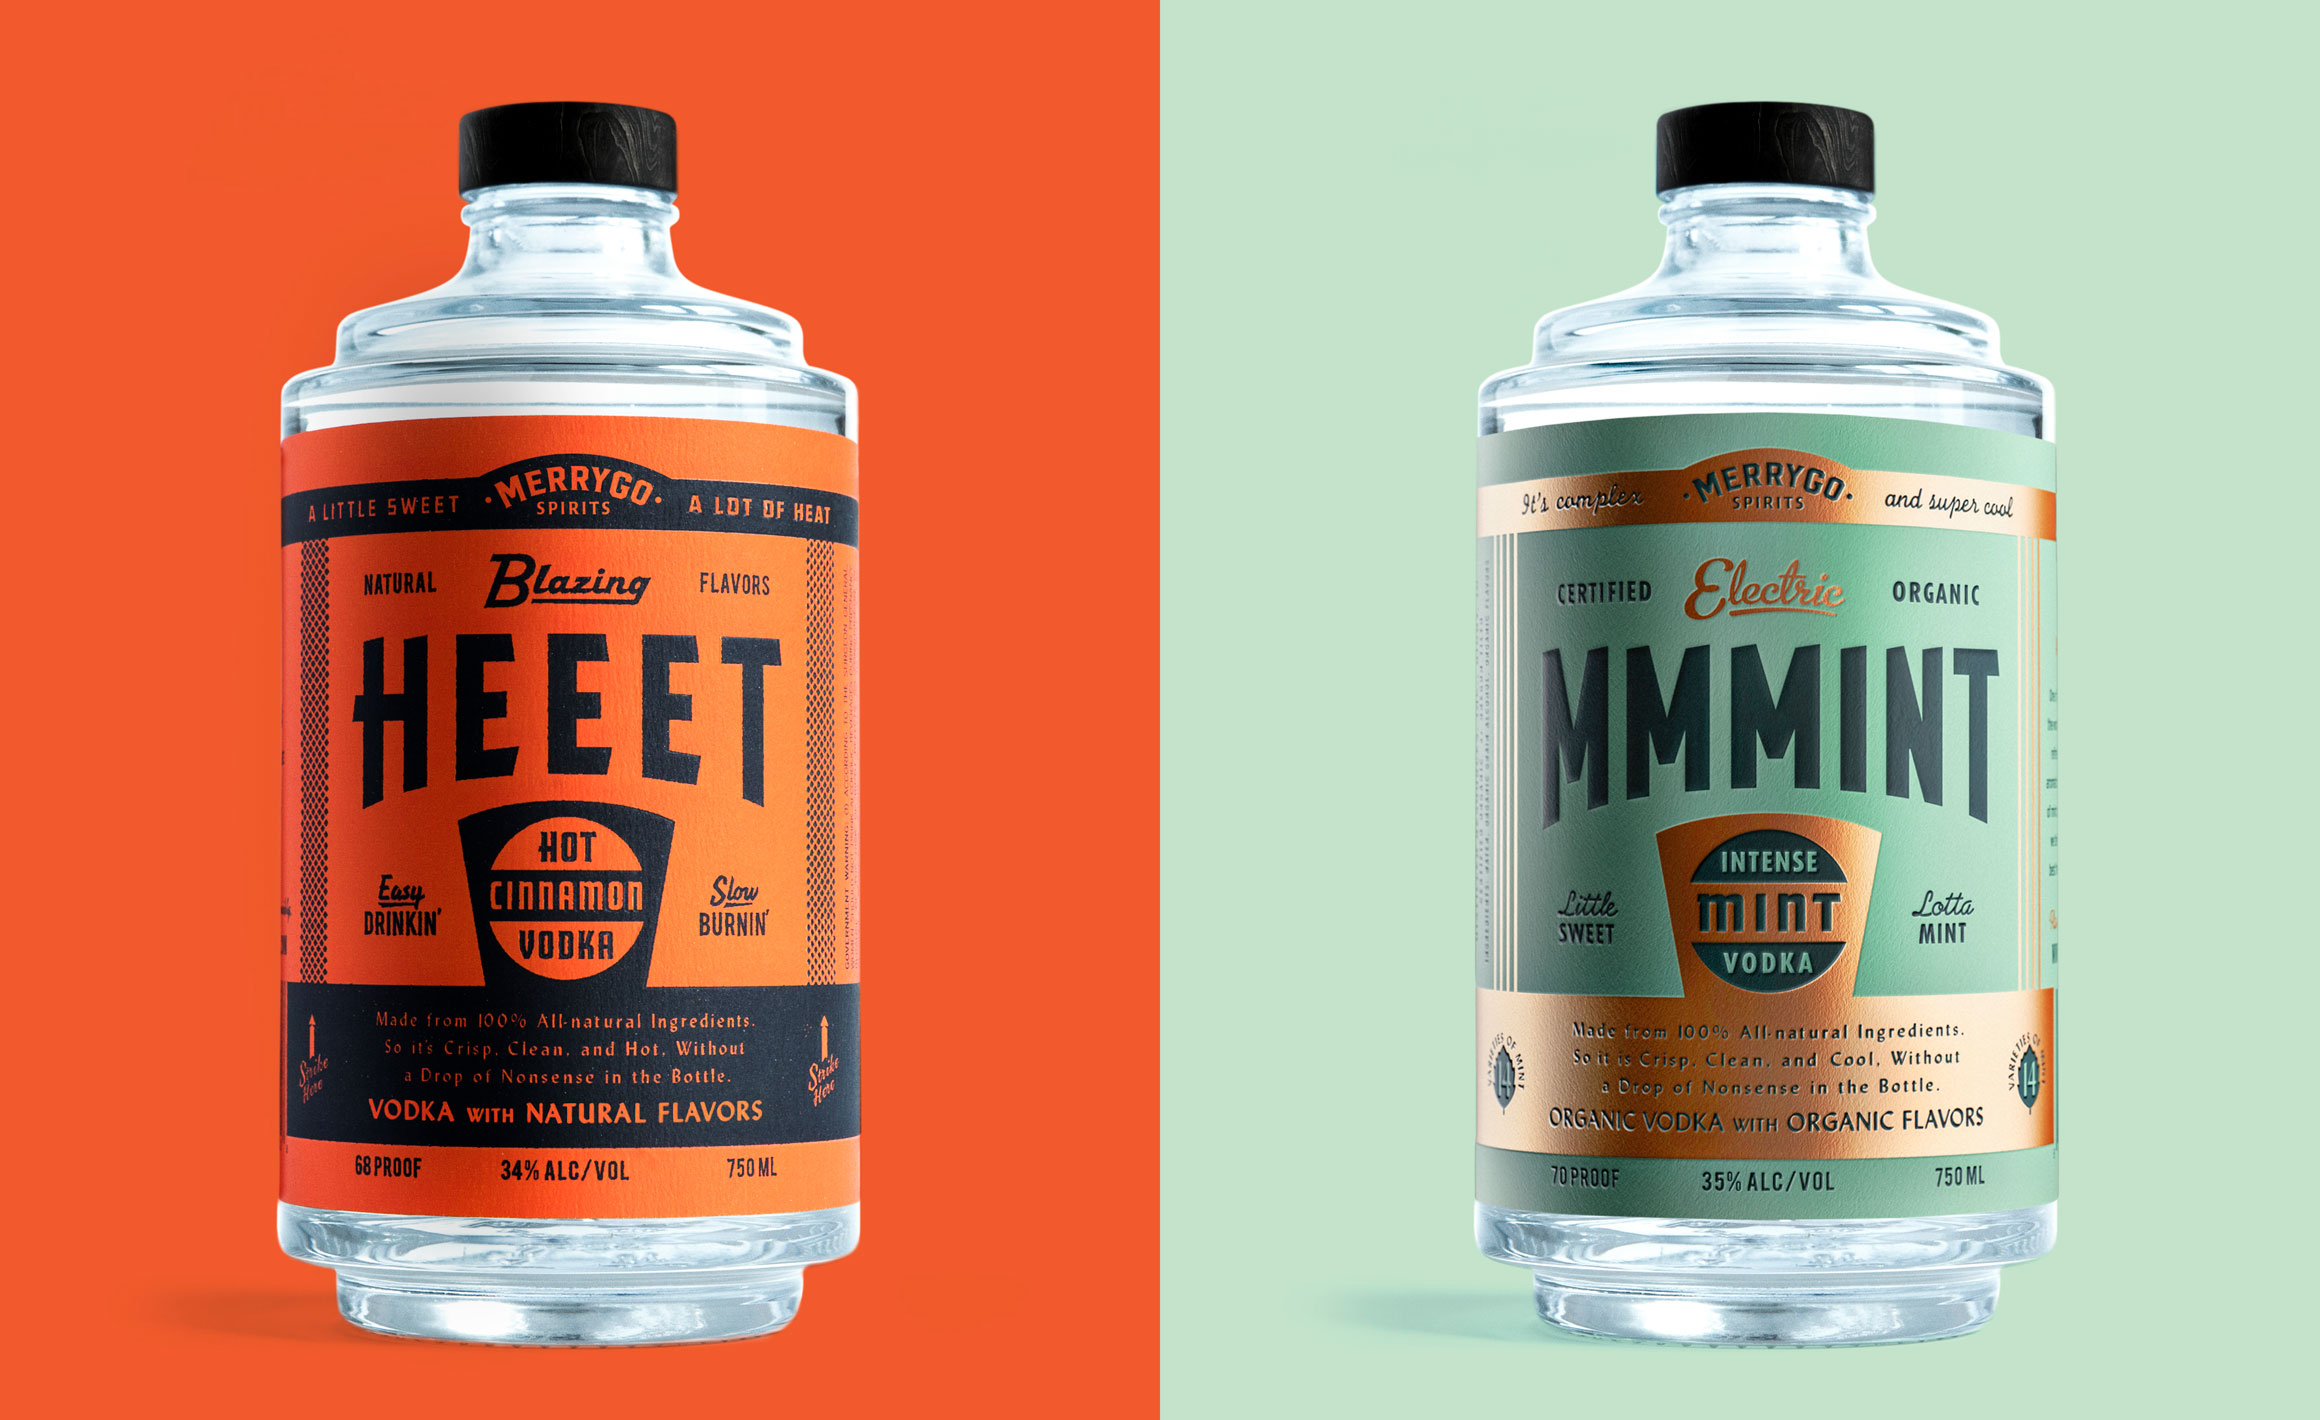 Heeet-Mmmint-Vodka.jpg